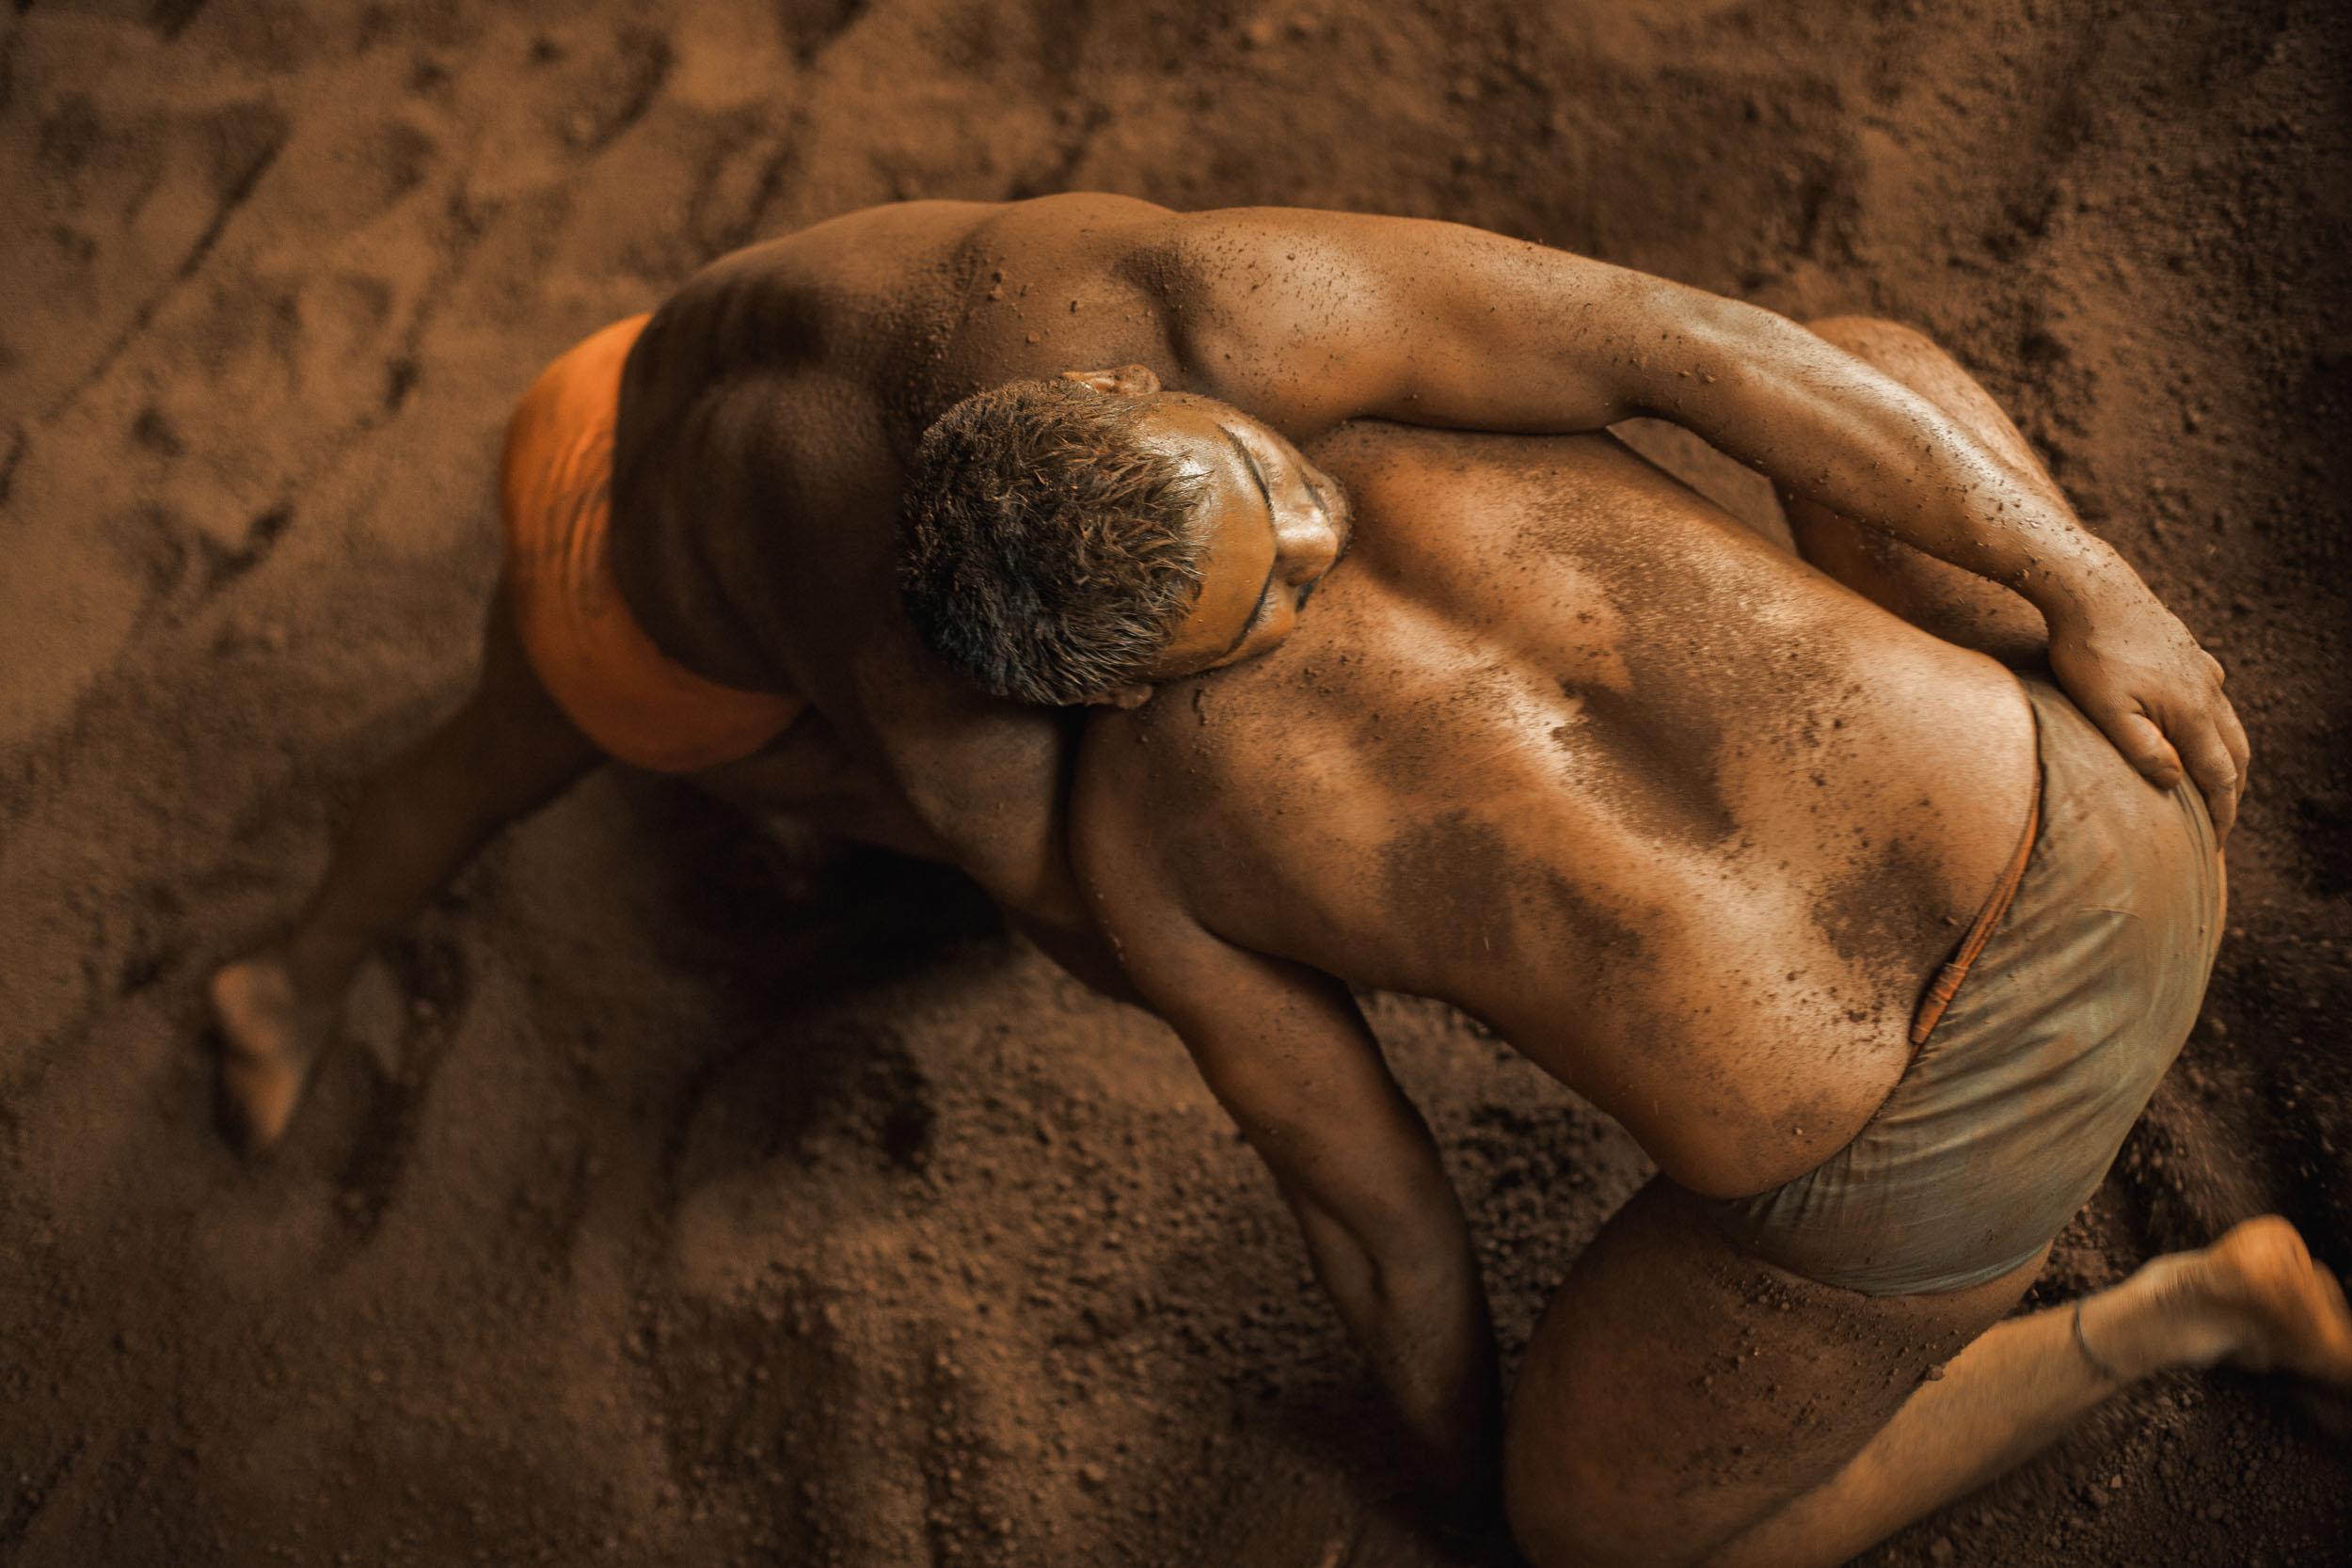 Sindhur_Photography_Travel_People_Wrestlers-20.JPG